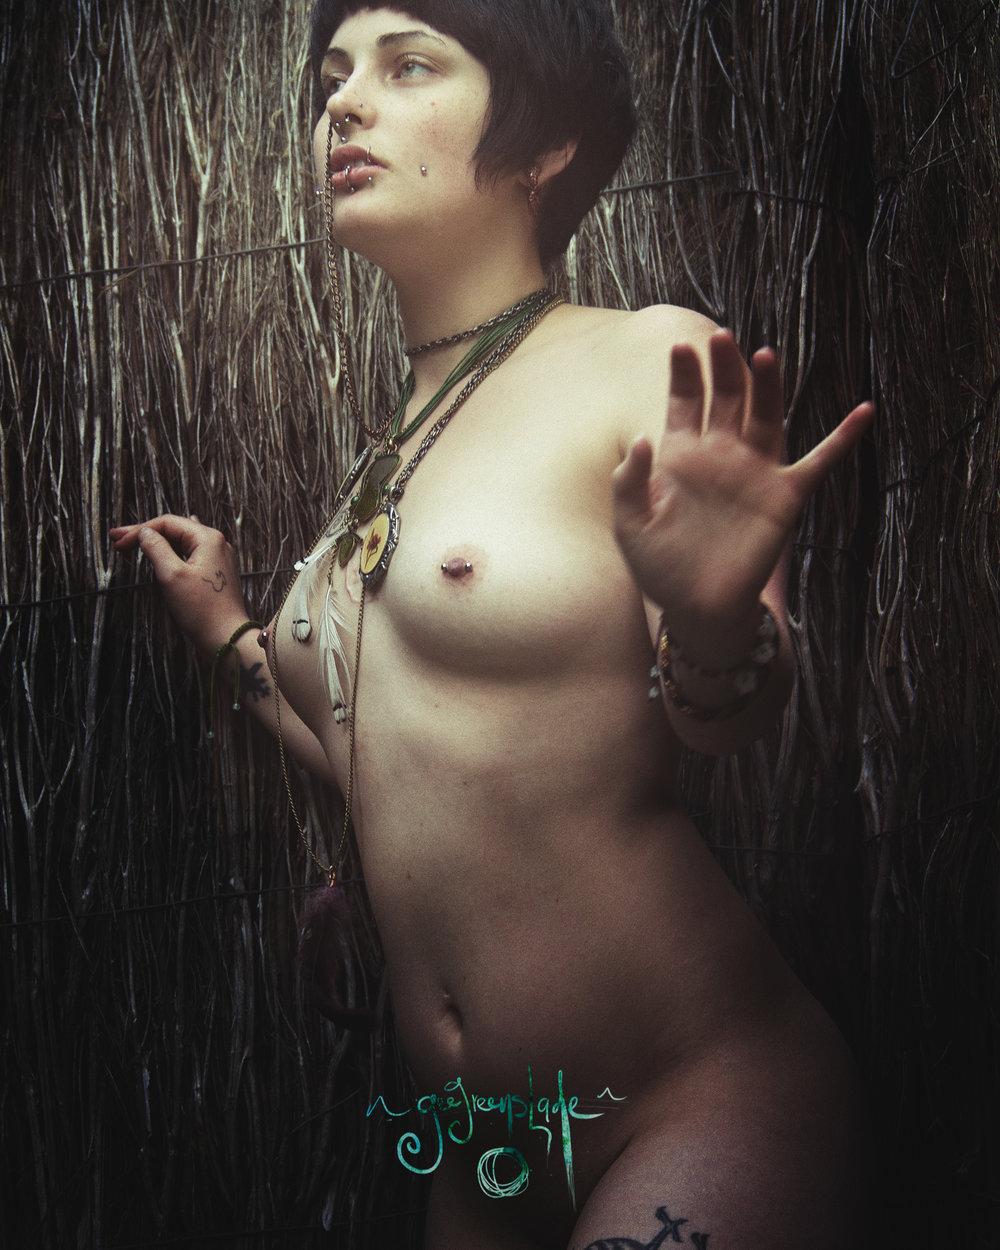 Gee-Greenslade-Artist-Photographer-Adelaide-South-Australia-19-nude-boudoir-moira.jpg